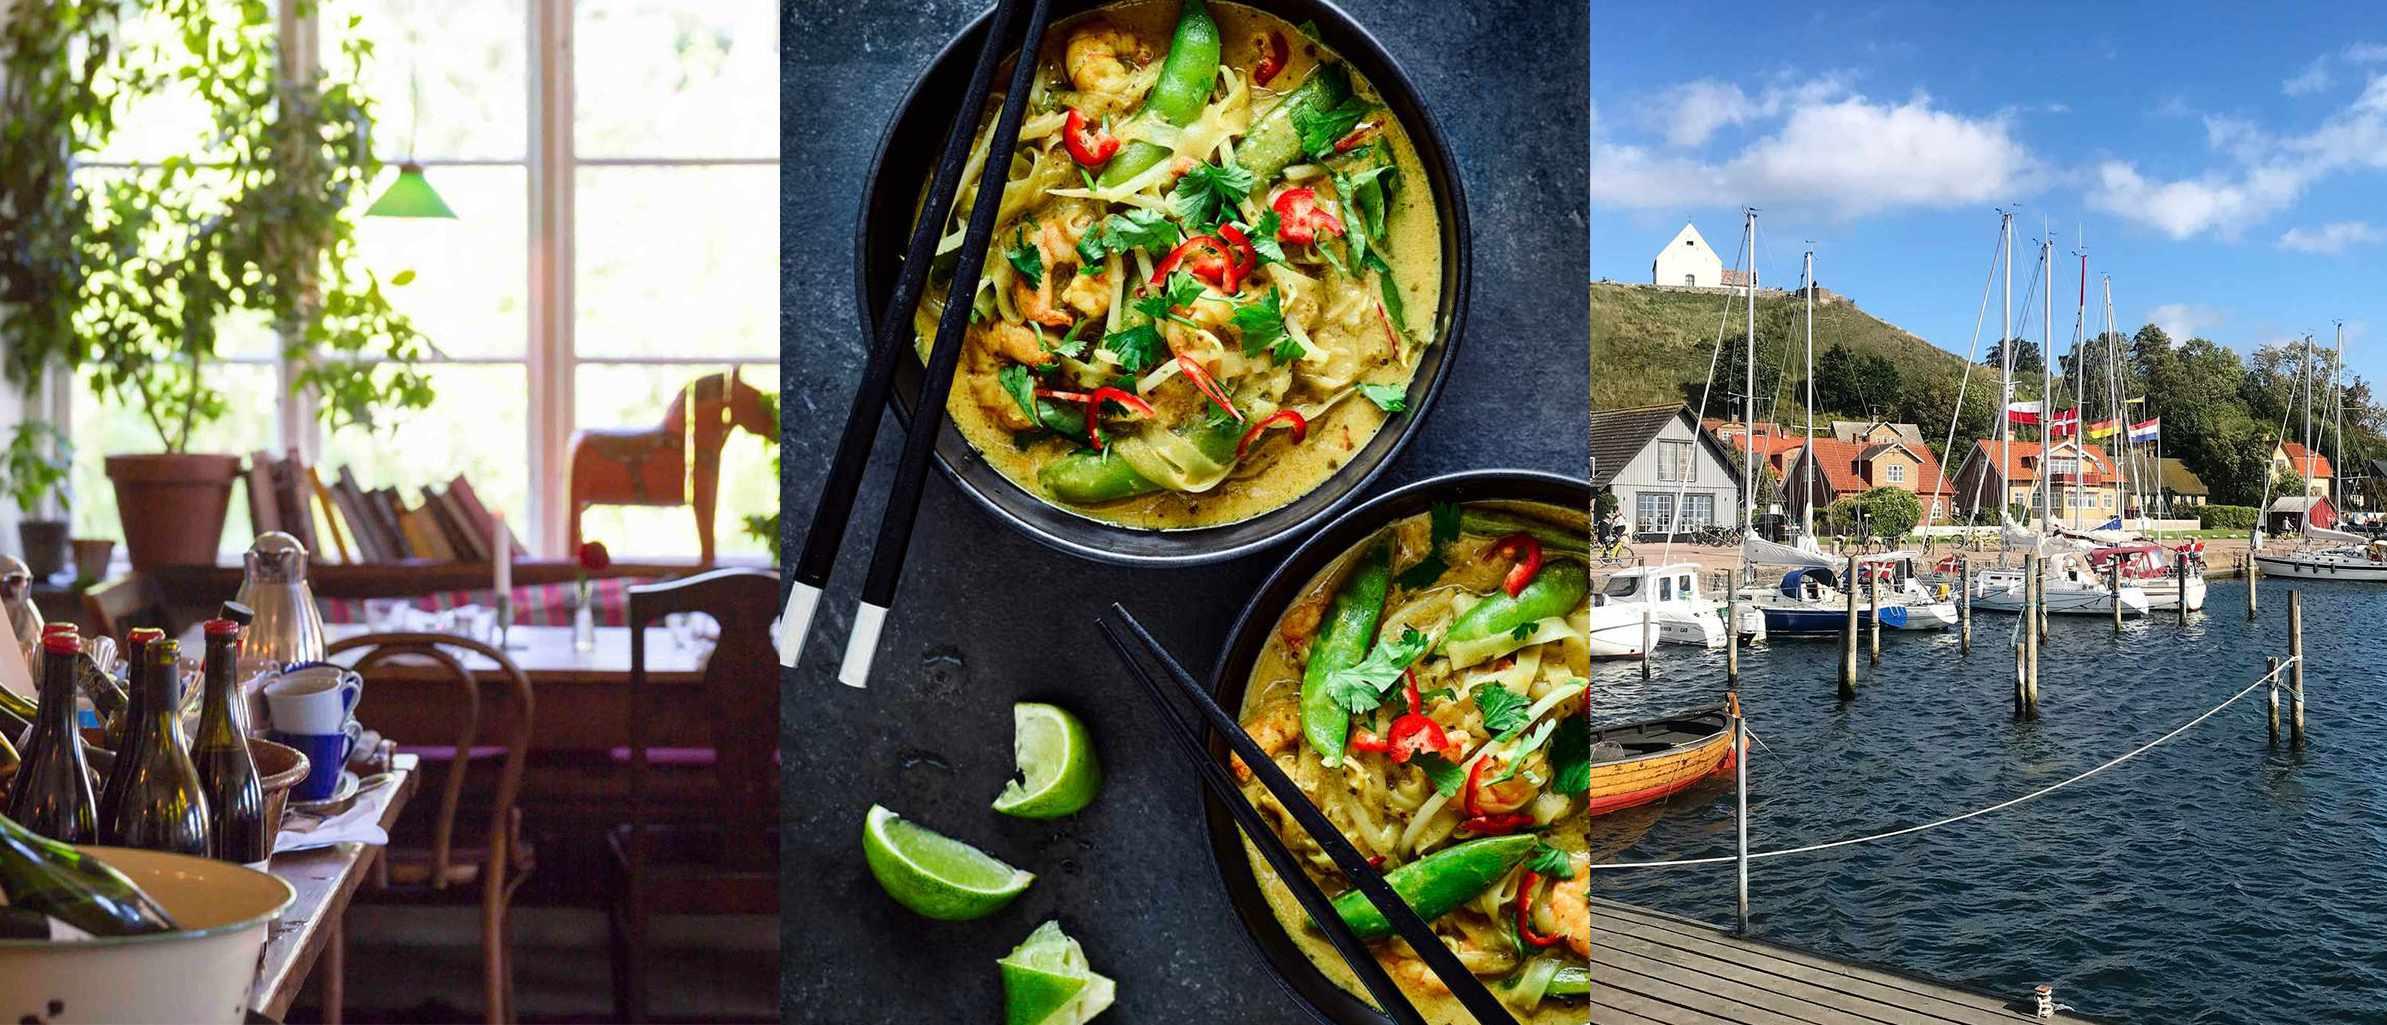 olive magazine food podcast – Skane Sweden Travel Tips and How to Make Laksa